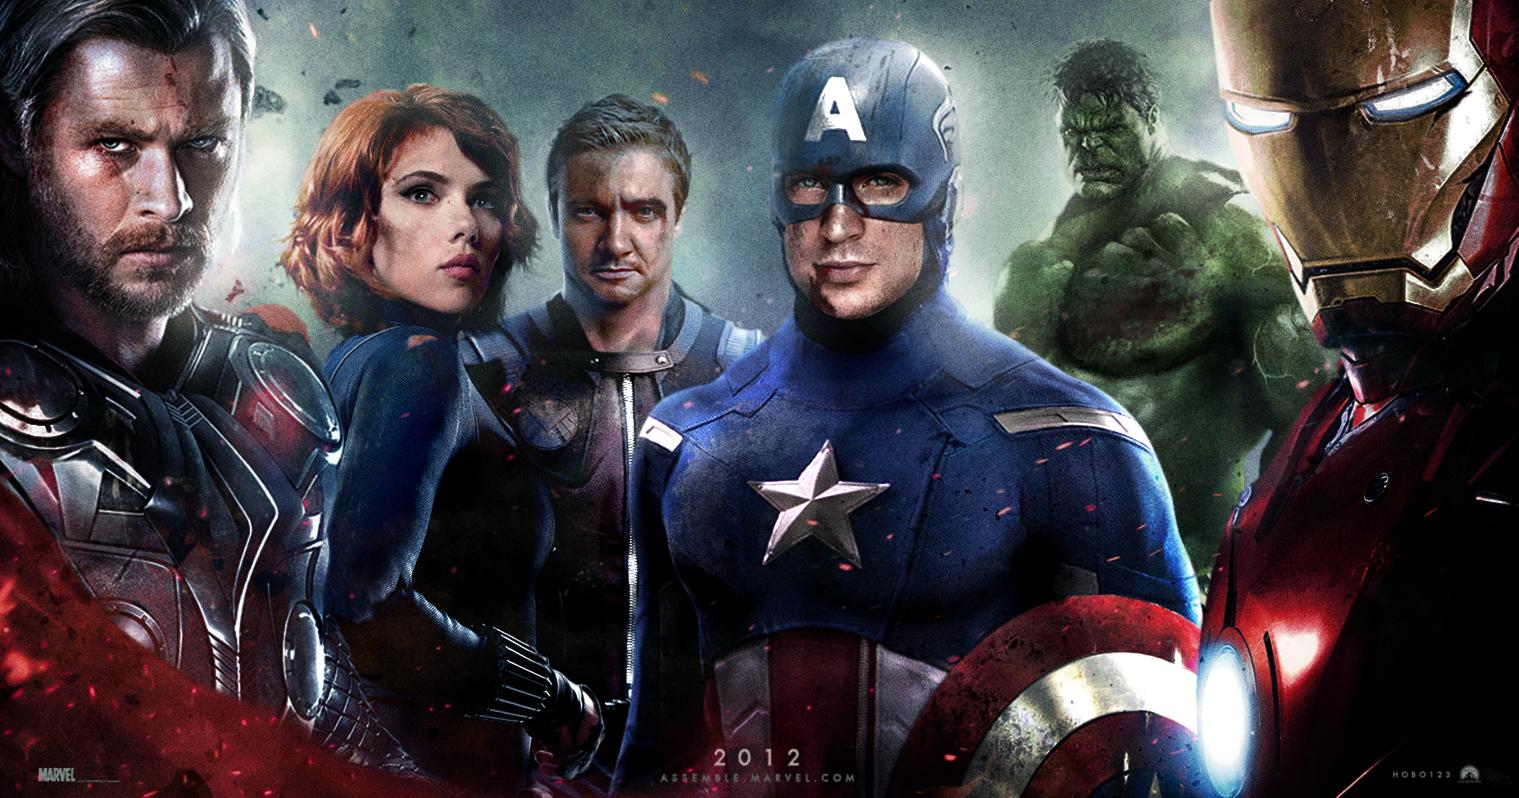 http://2.bp.blogspot.com/-T52P2yuHrx4/T8Ubr-R2HQI/AAAAAAAADaM/ZKoCMu7iv1A/s1600/Avengers,+The+Promo+Image.png